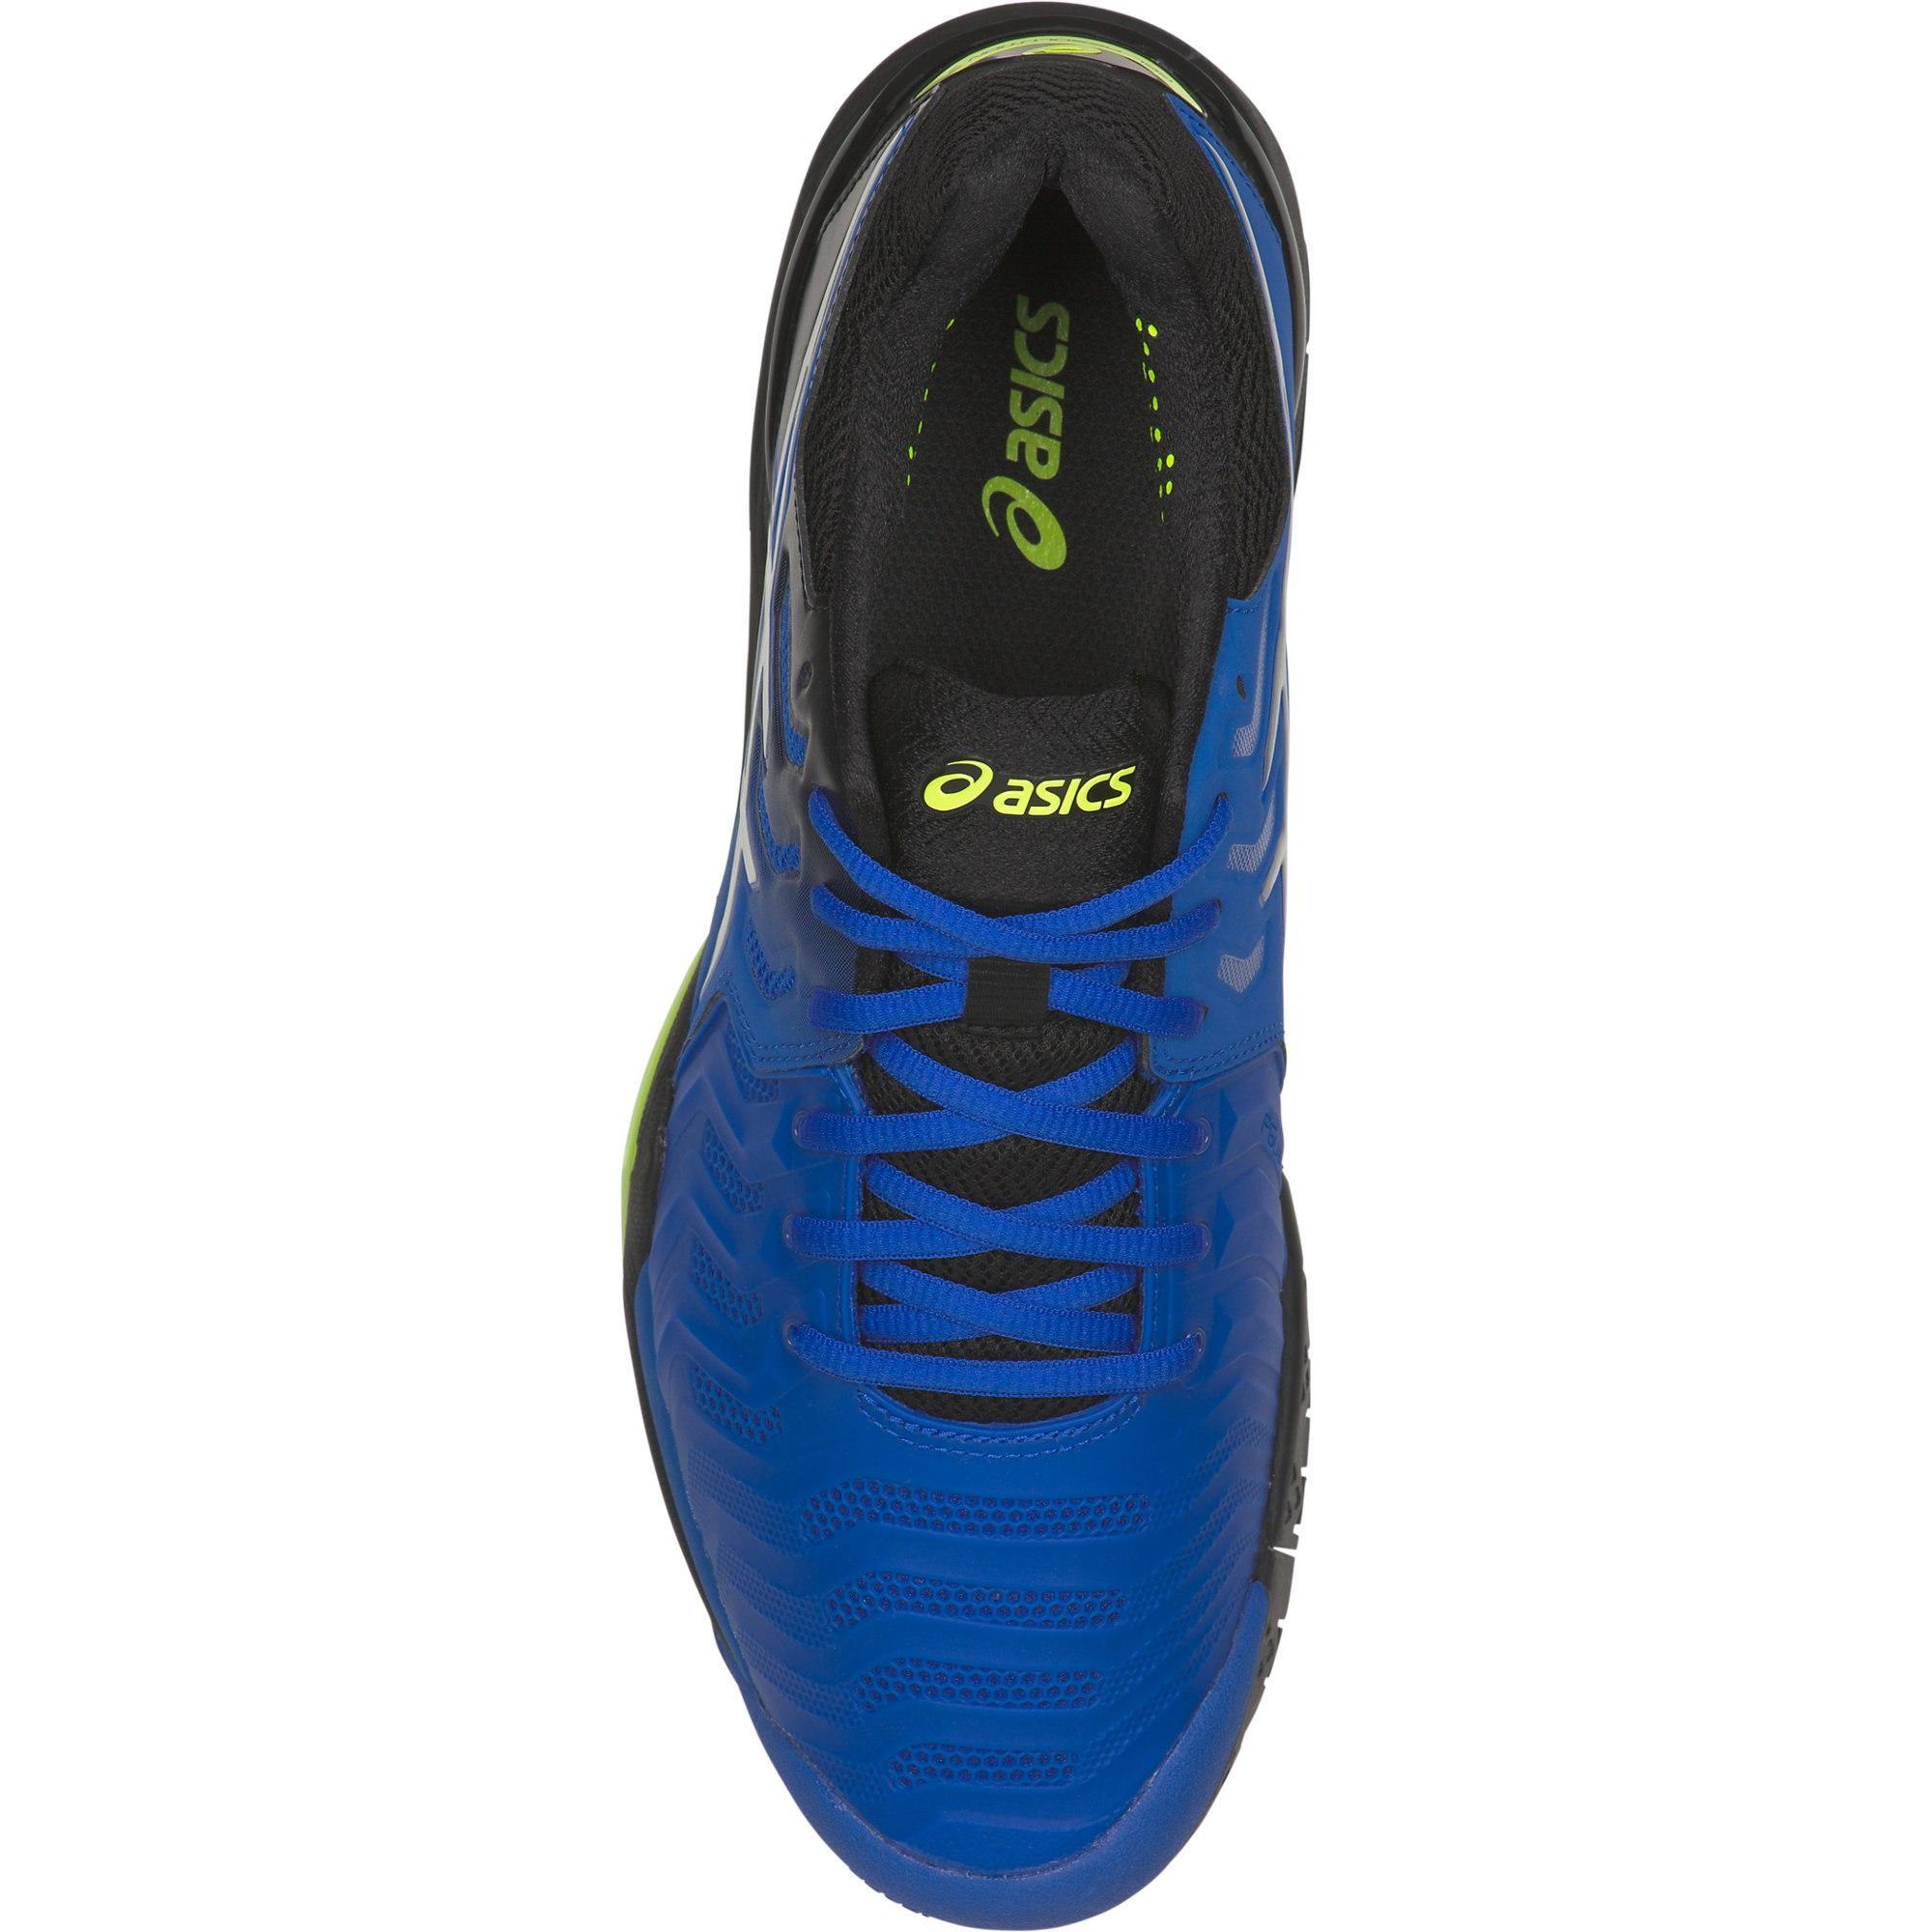 813c3d985e6421 Asics Mens GEL-Resolution 7 Tennis Shoes - Illusion Blue/Black ...